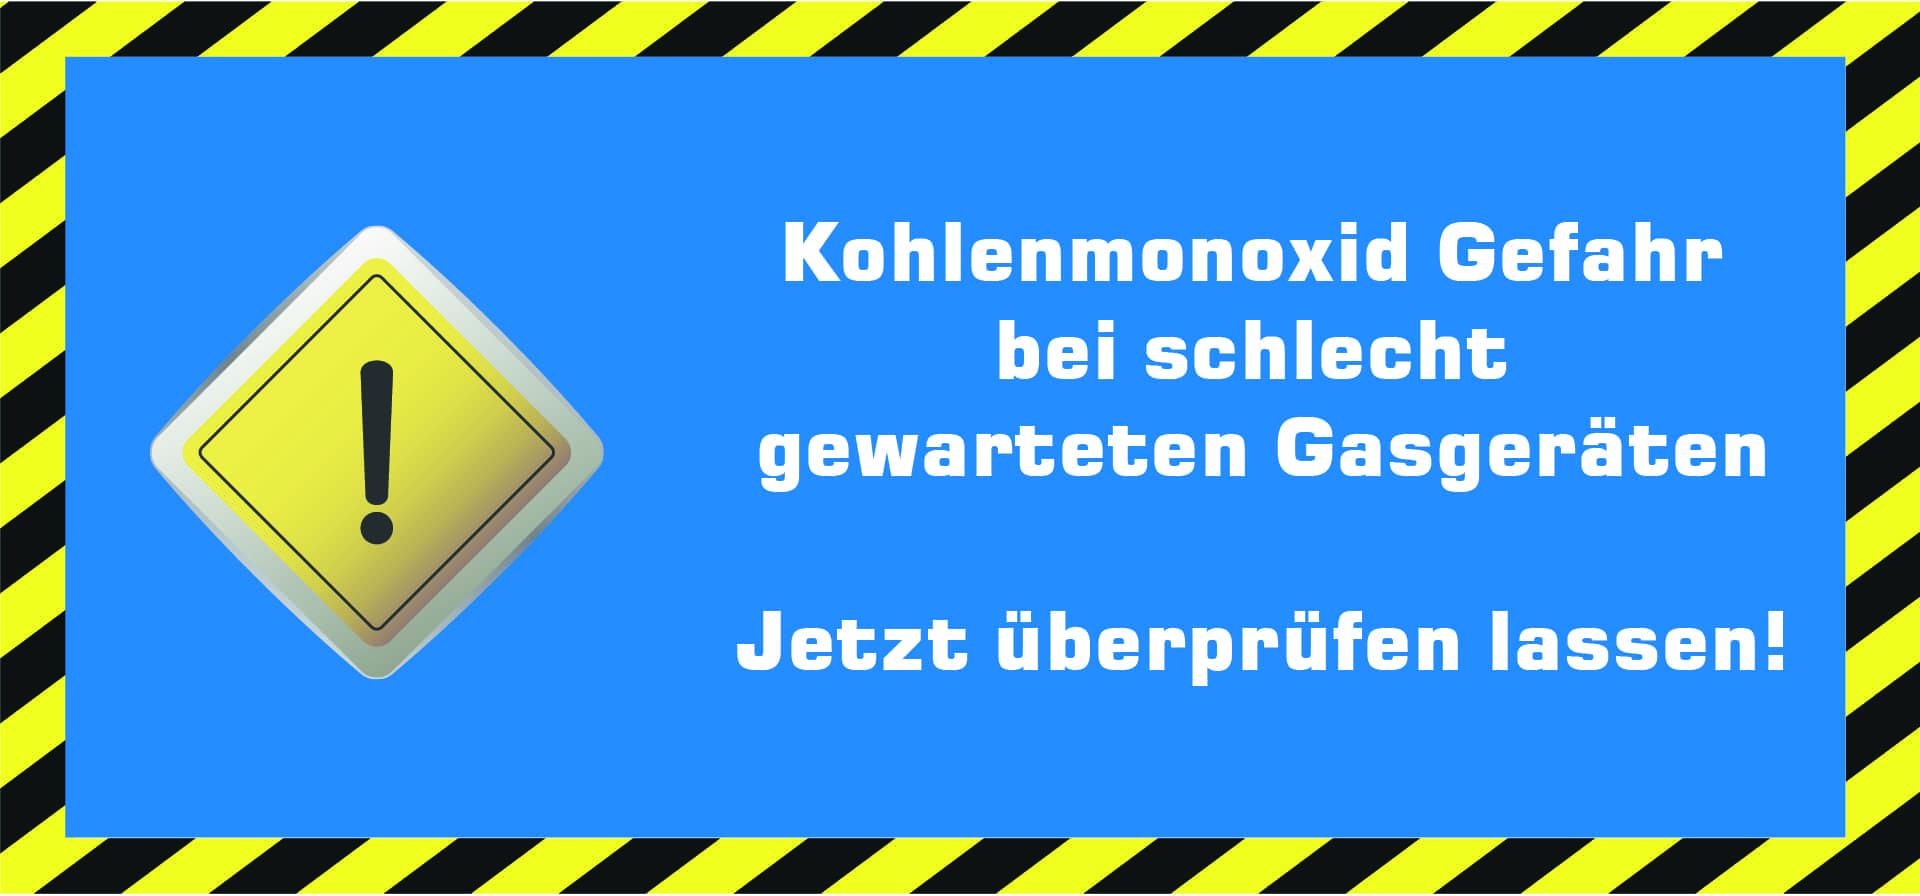 Gefahr durch Kohlenmonoxid